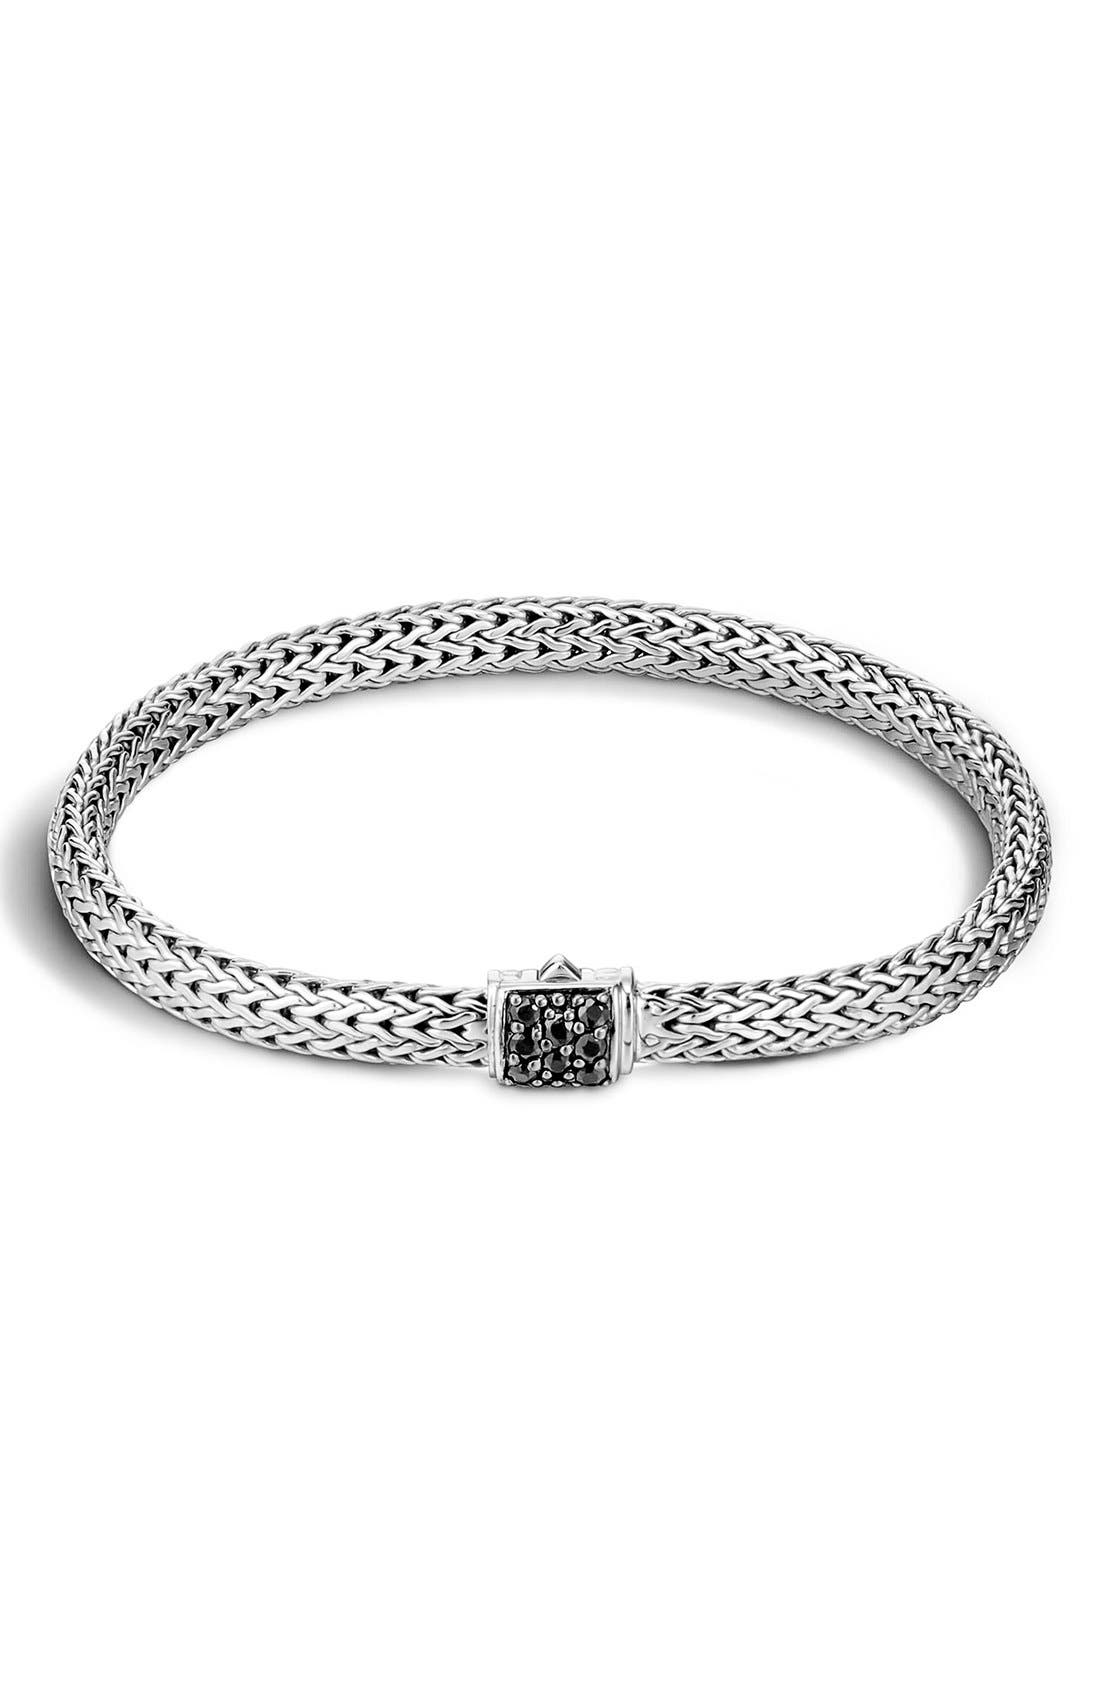 Alternate Image 1 Selected - John Hardy 'Classic Chain' Extra Small Bracelet